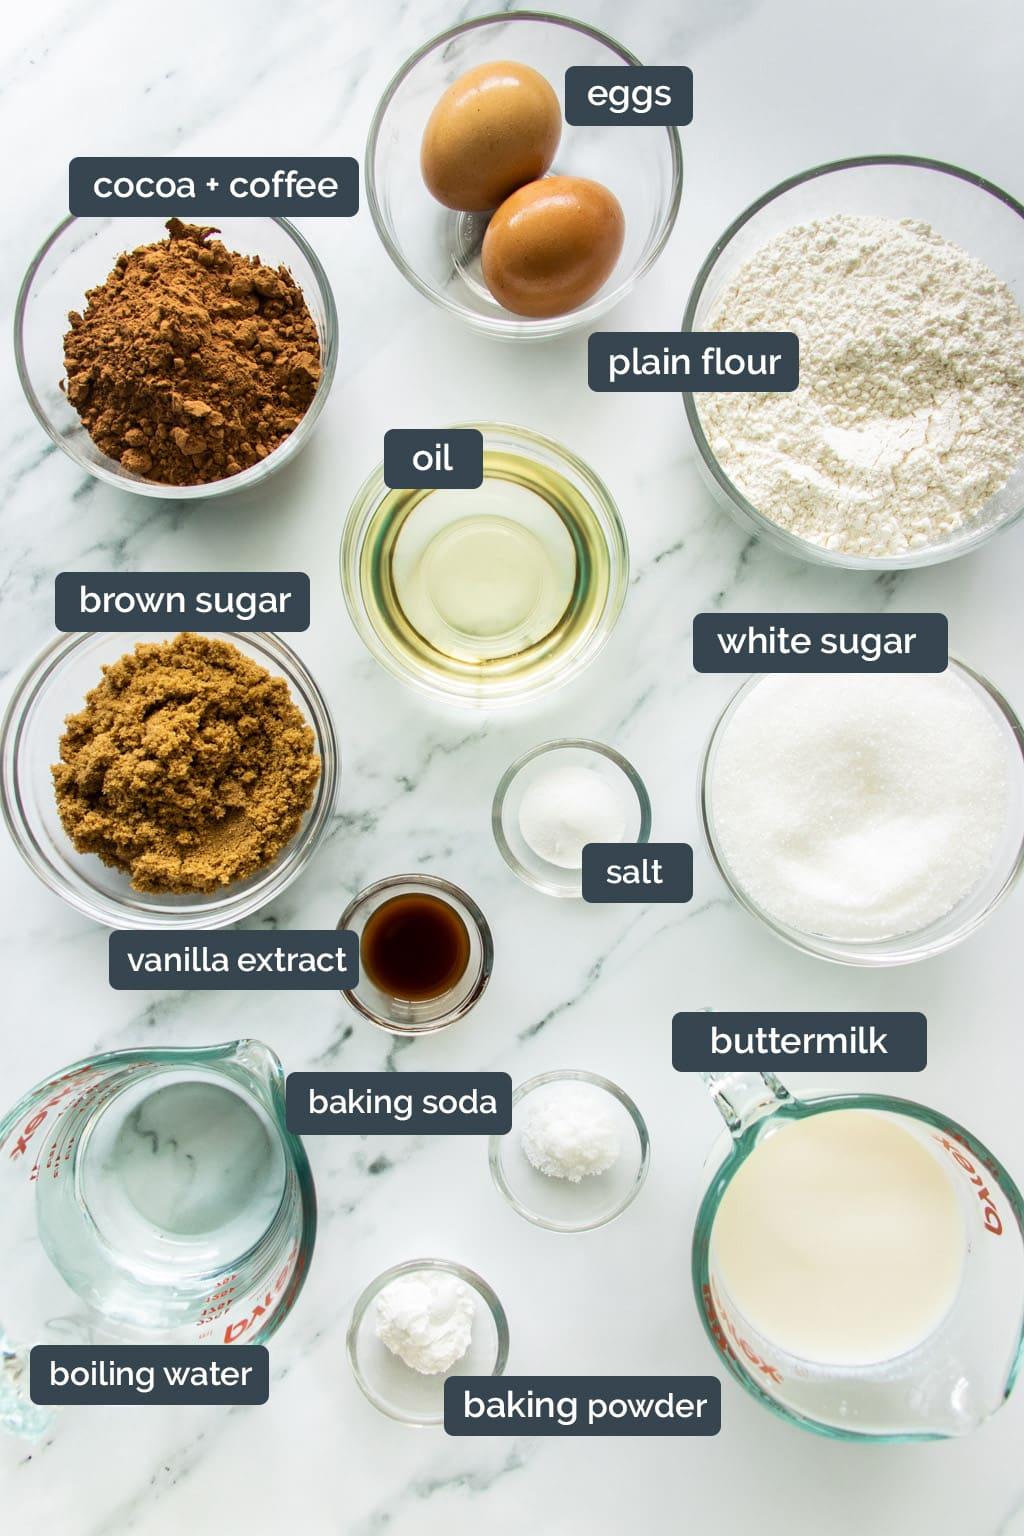 Chocolate cake ingredients